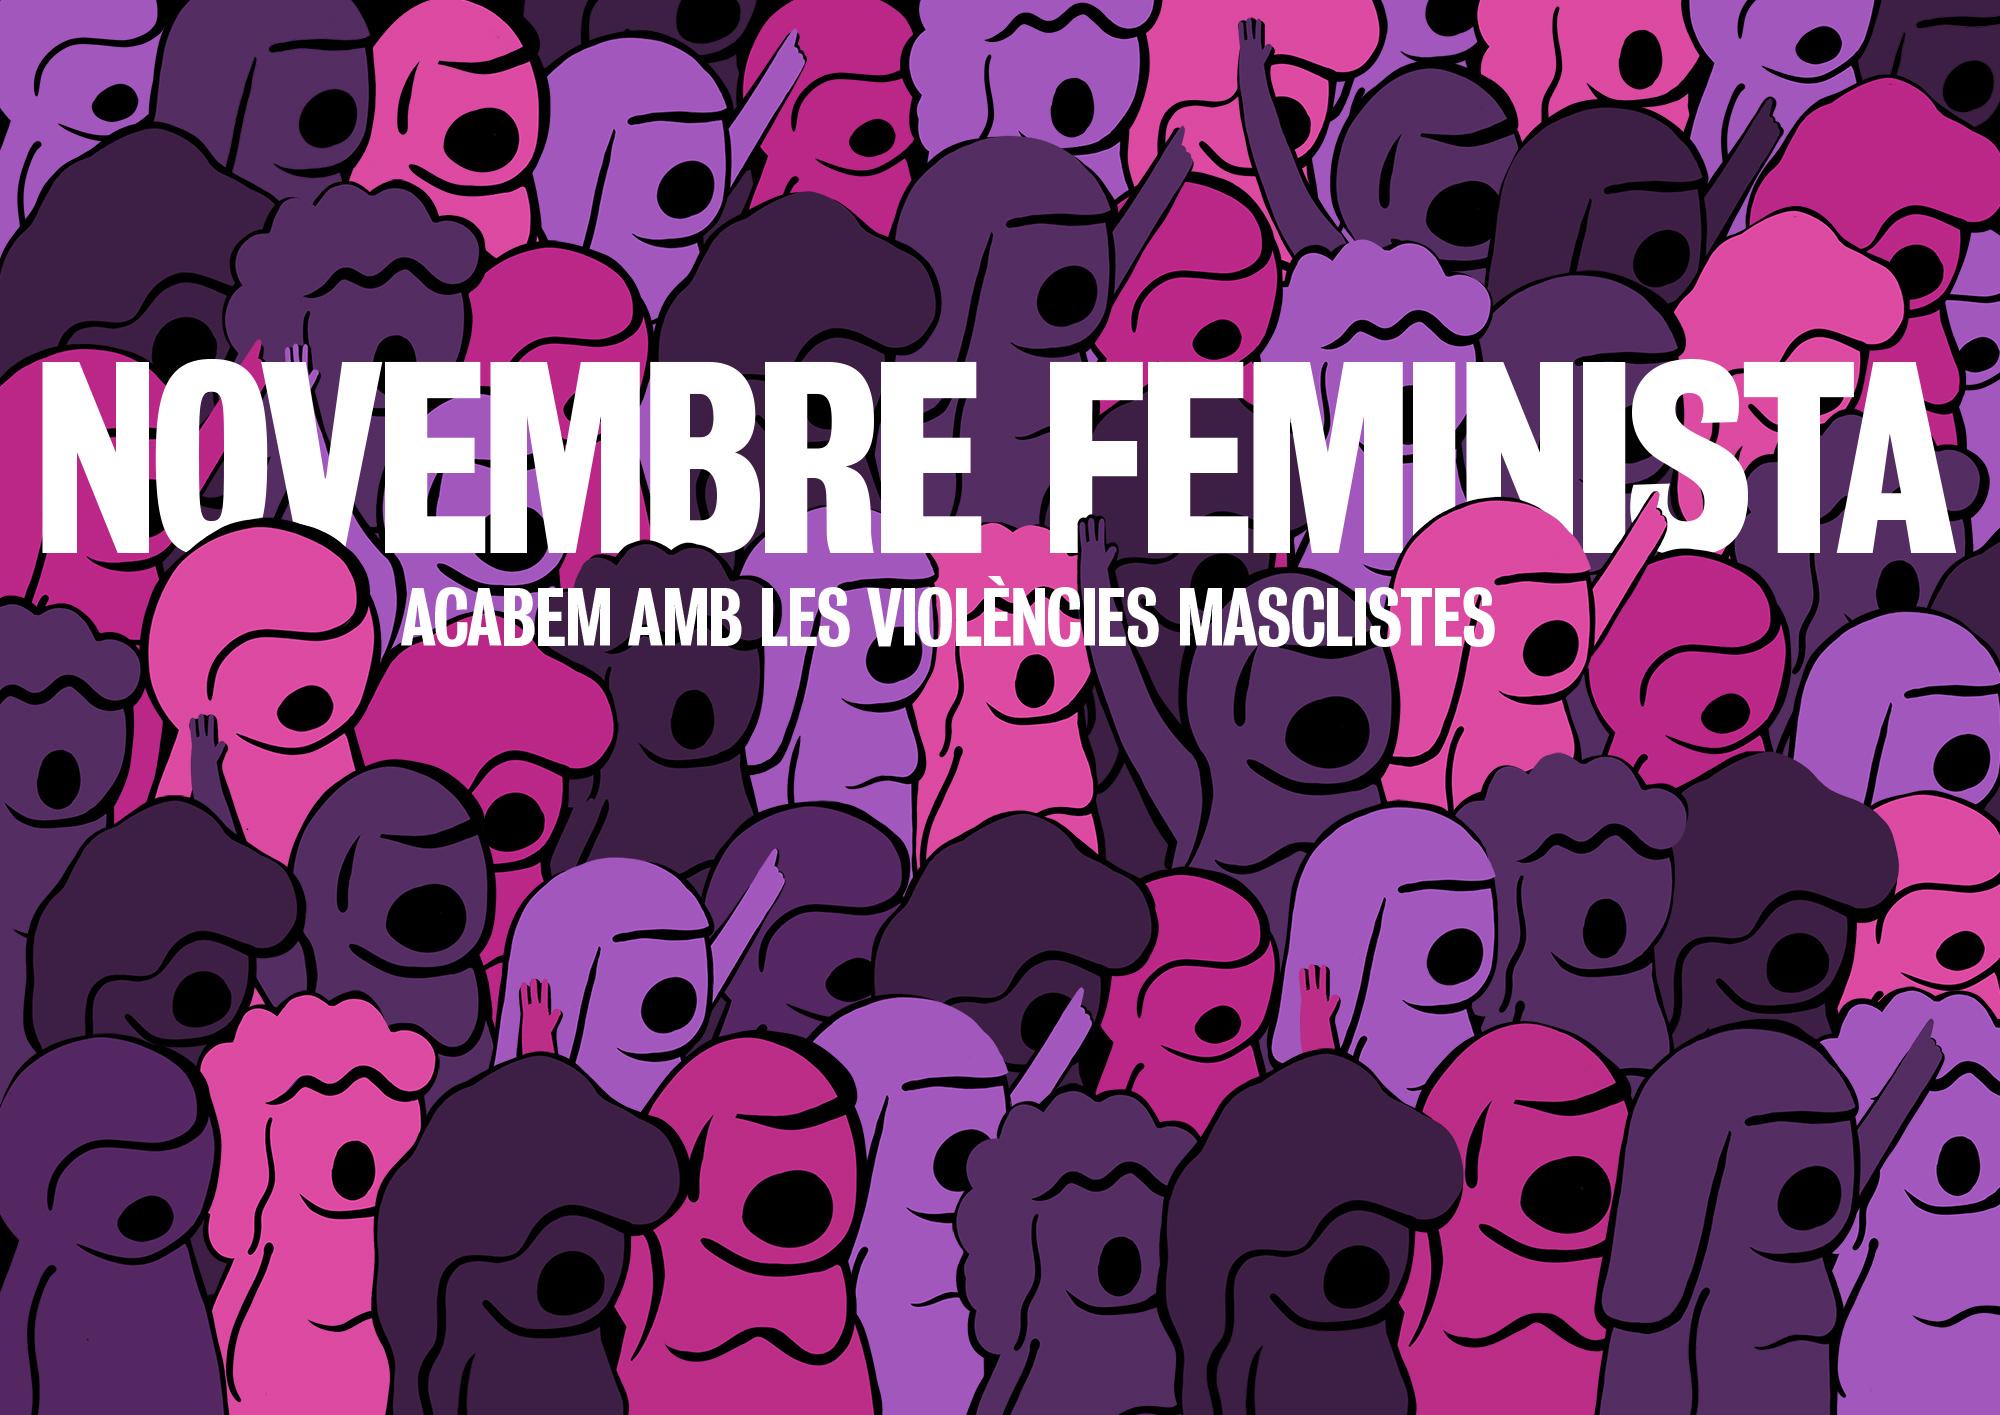 Novembre Feminista